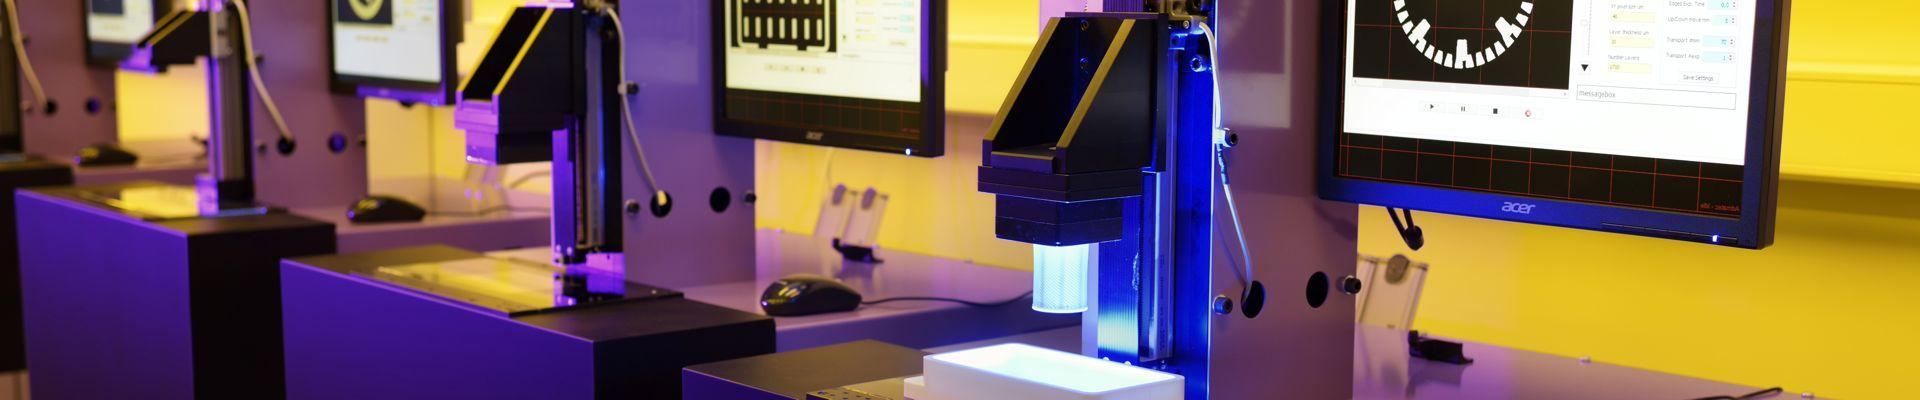 Admaflex 3D print technology